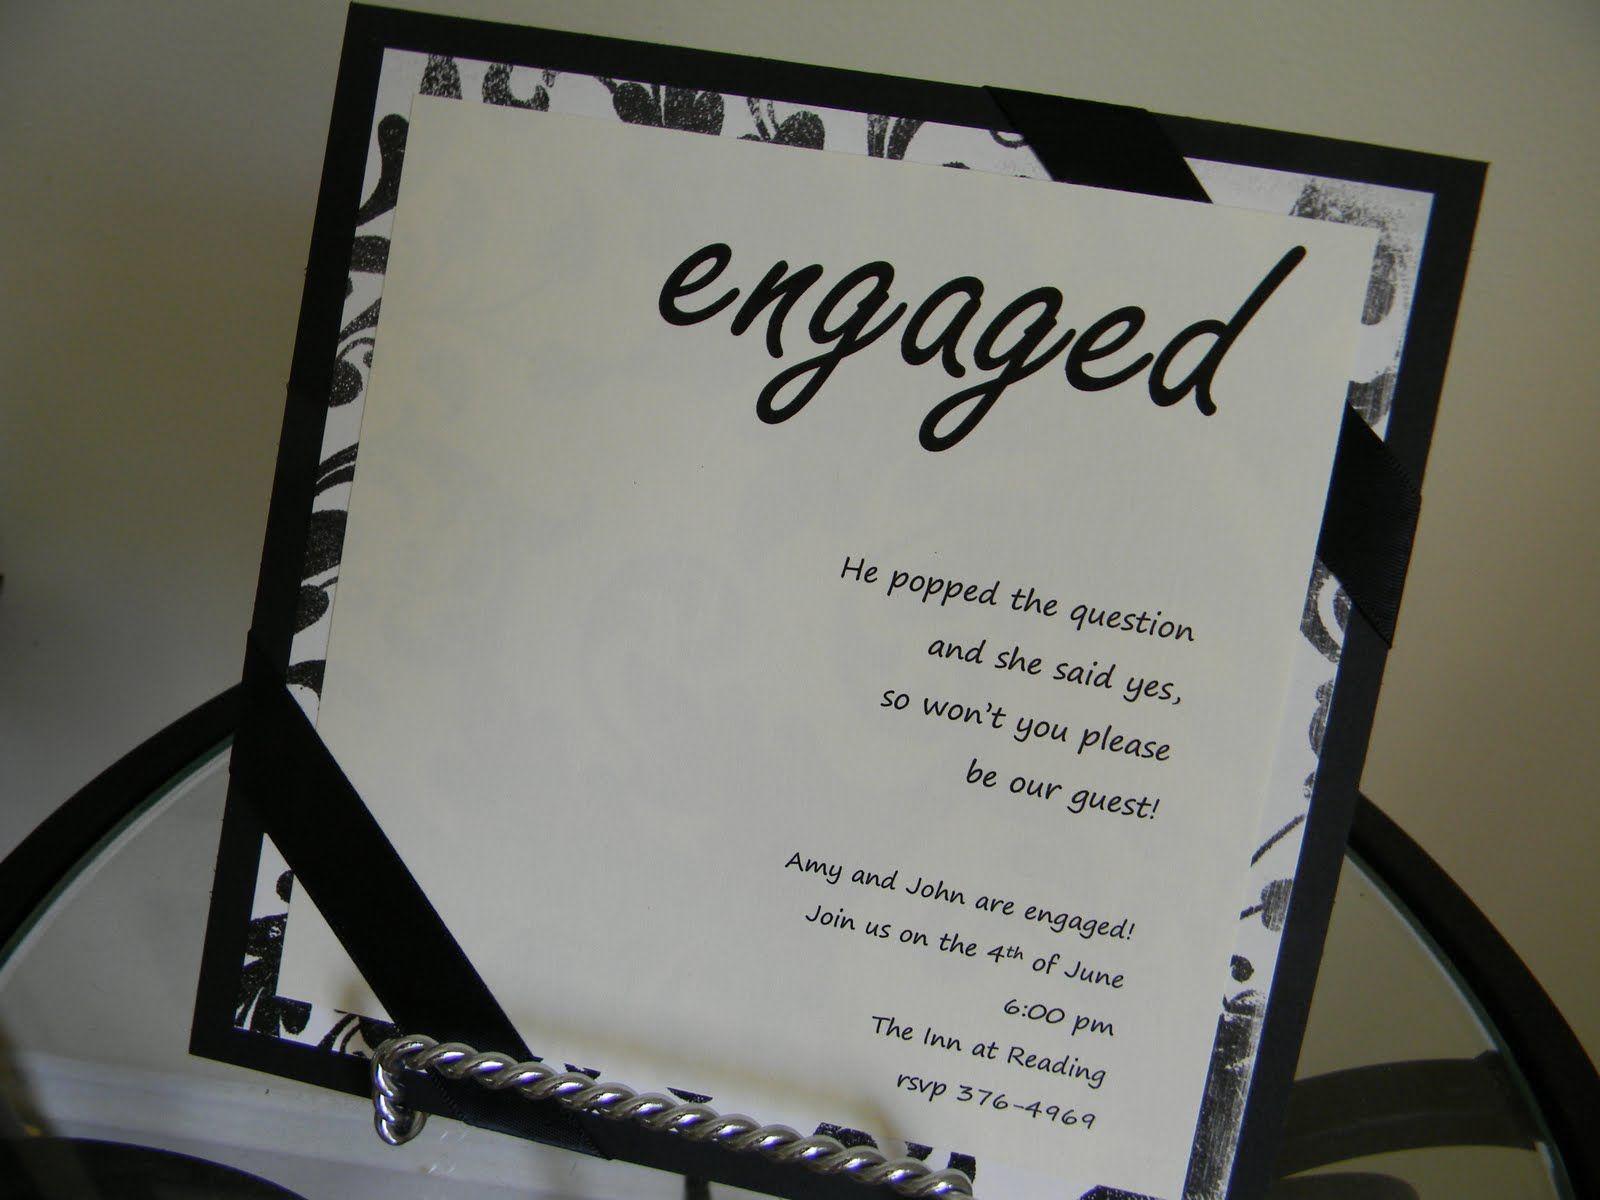 Engagement Party Invitations | Davis Designs: Engagement Party ...